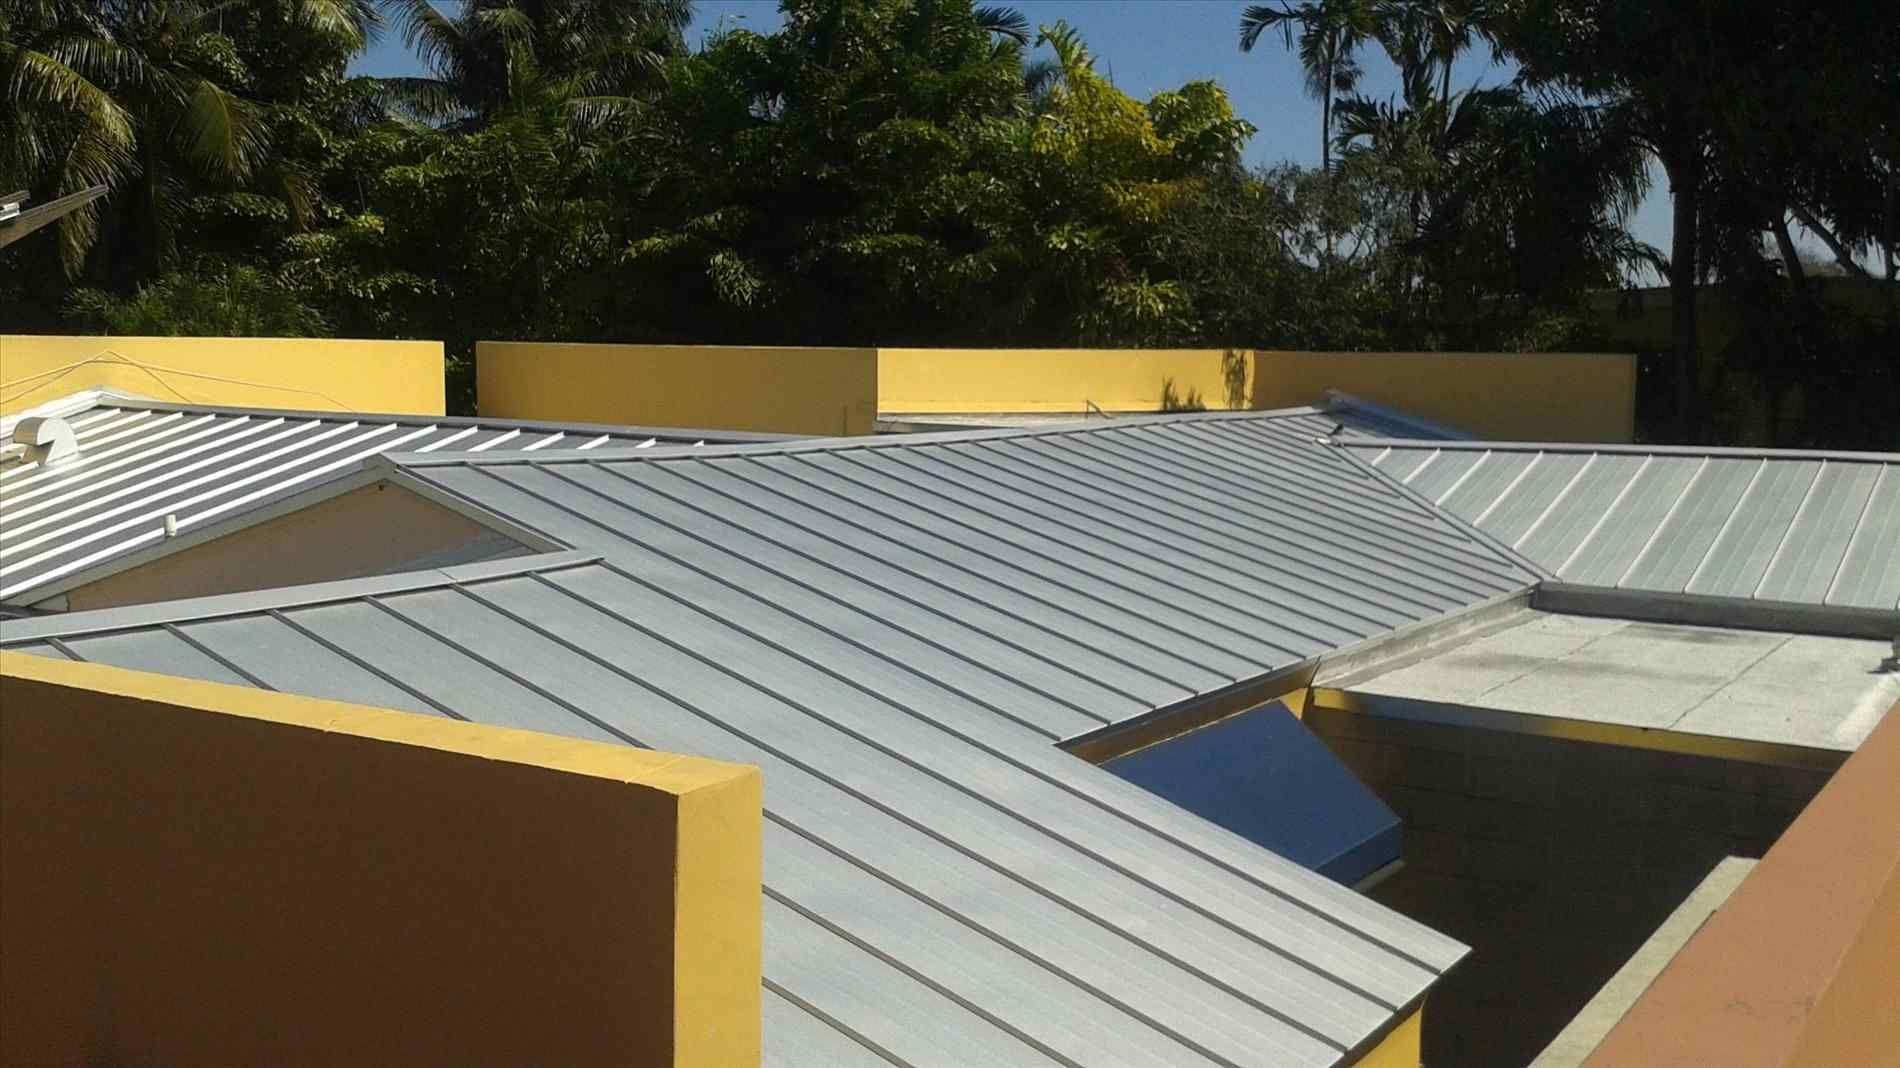 Metal Roofs Florida Metal roof, Roof styles, Roof design